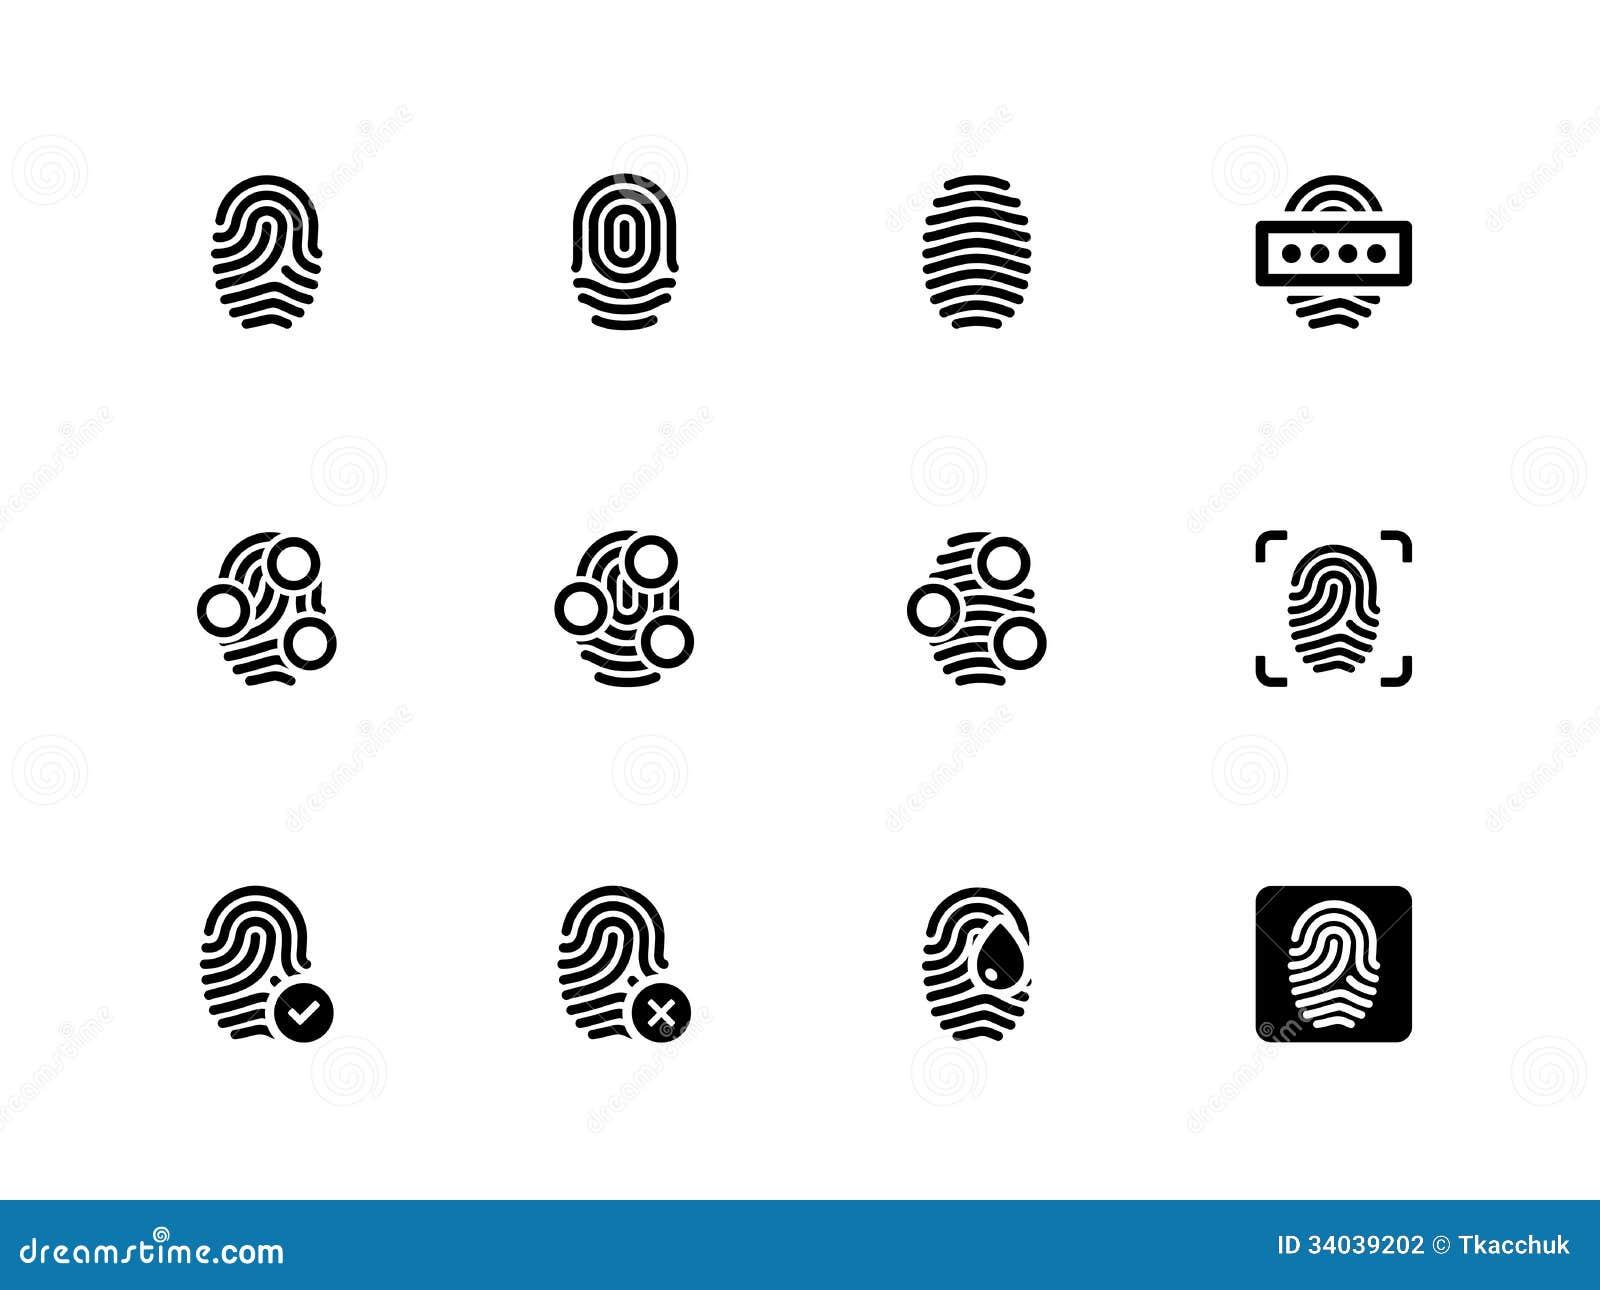 Fingerprint Icons On White Background. Stock Photography ...